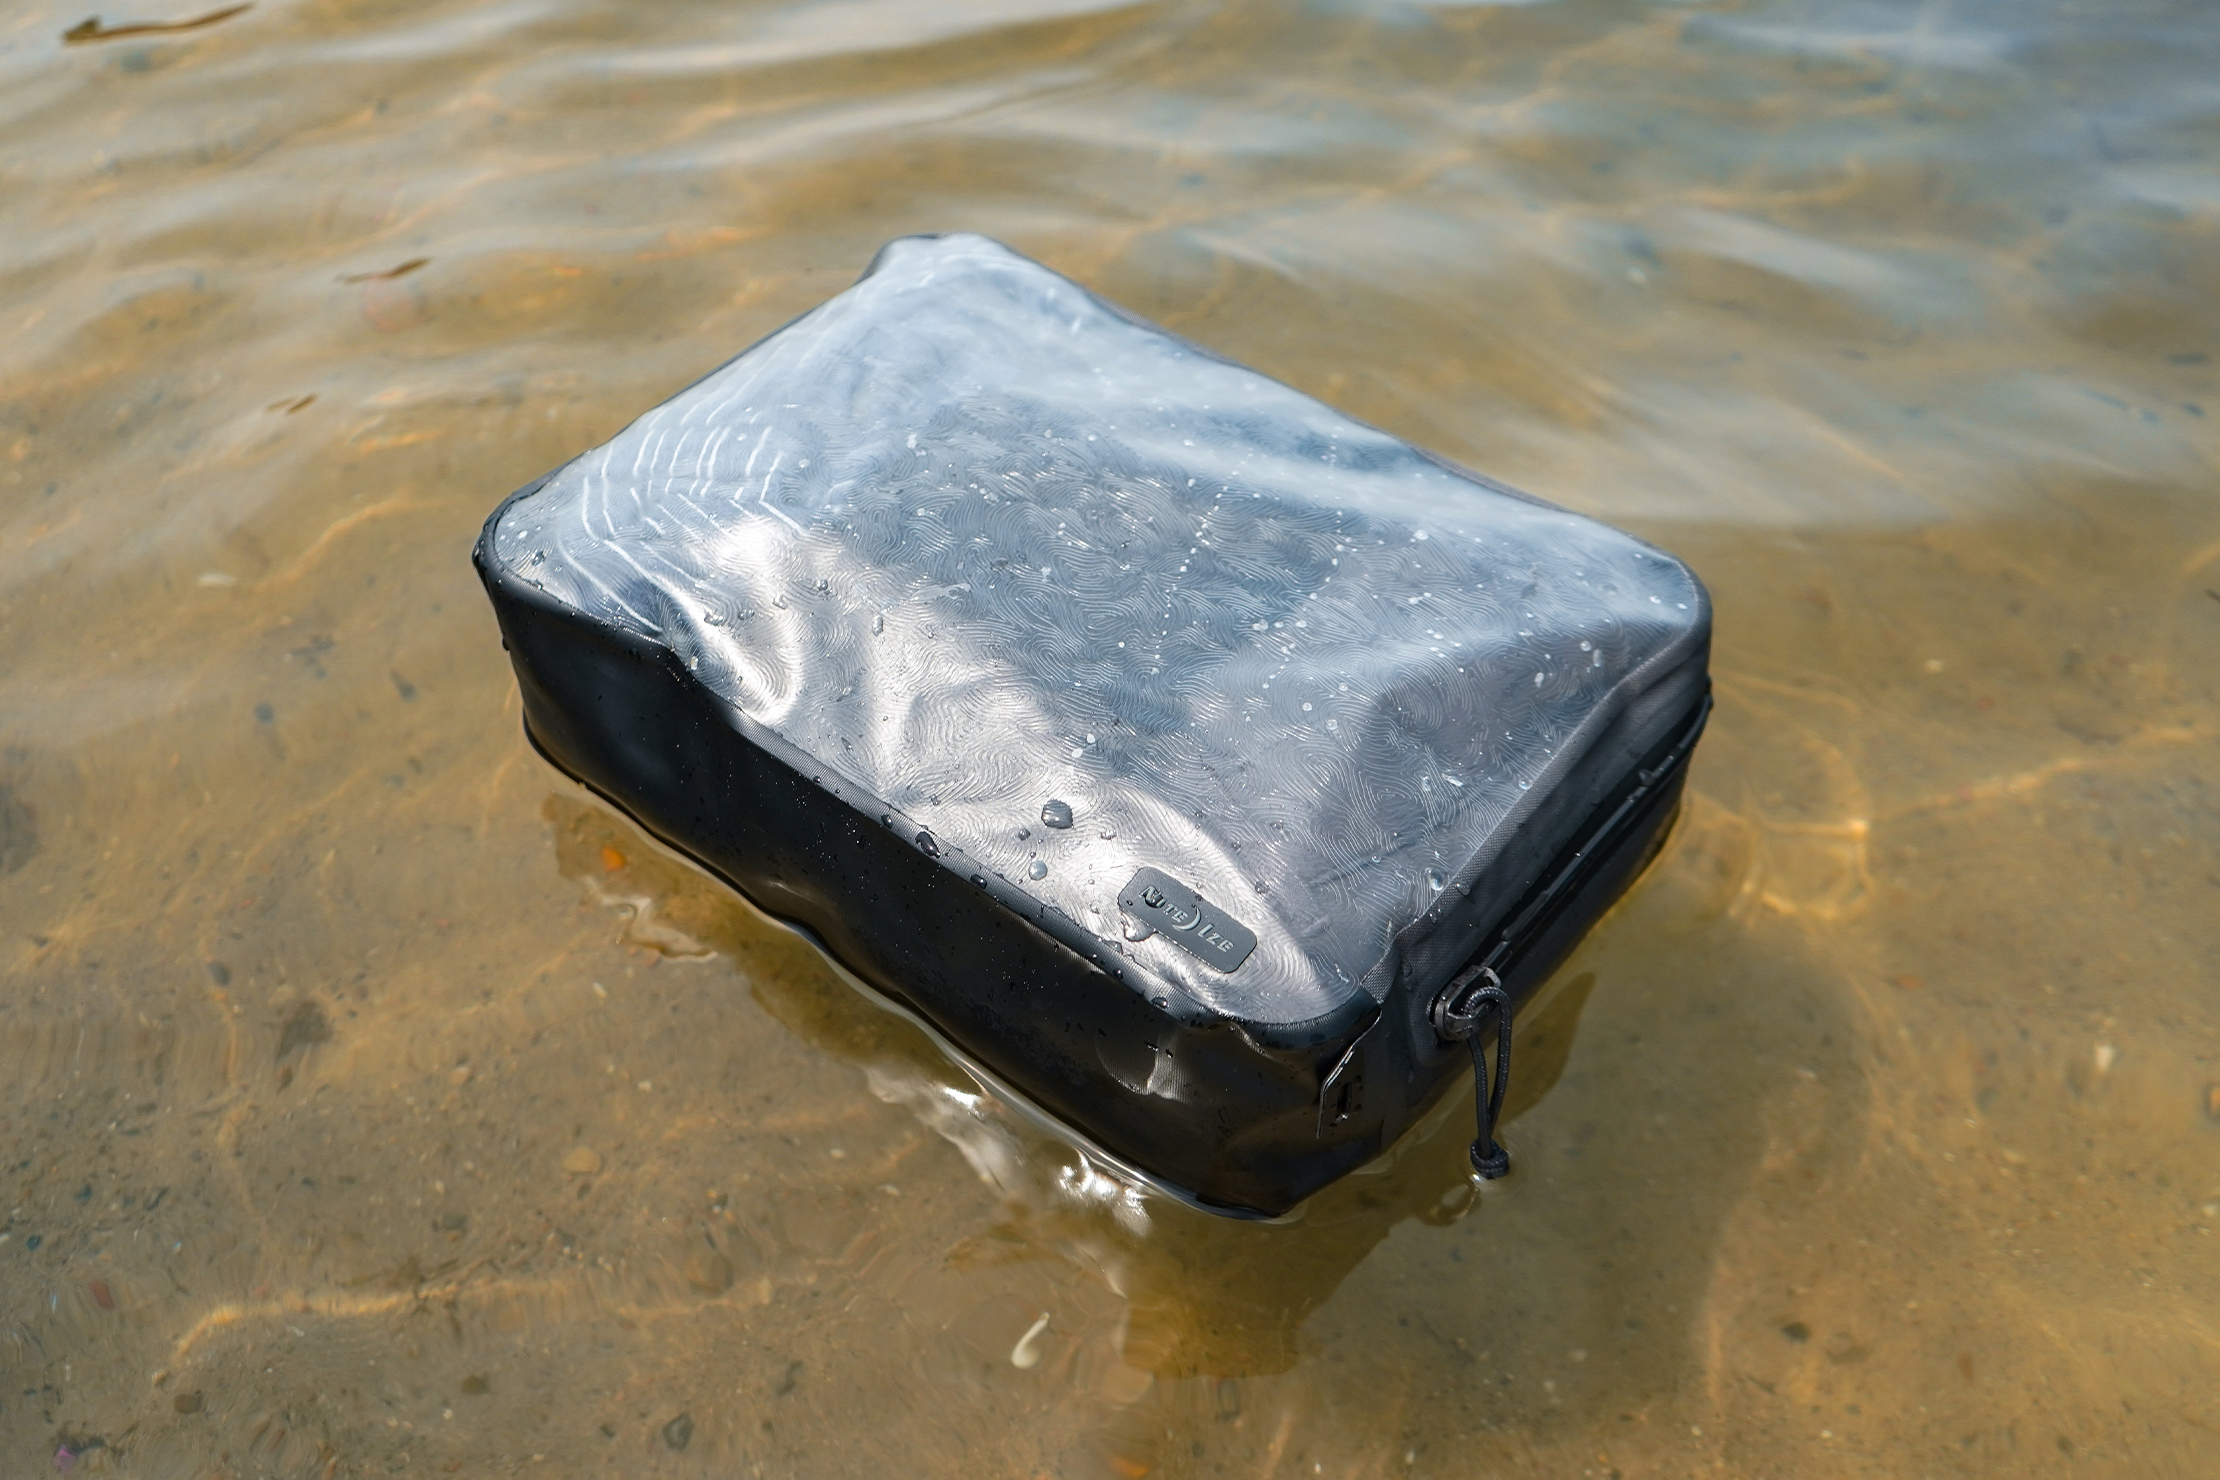 Nite Ize RunOff Waterproof Packing Cubes Floating